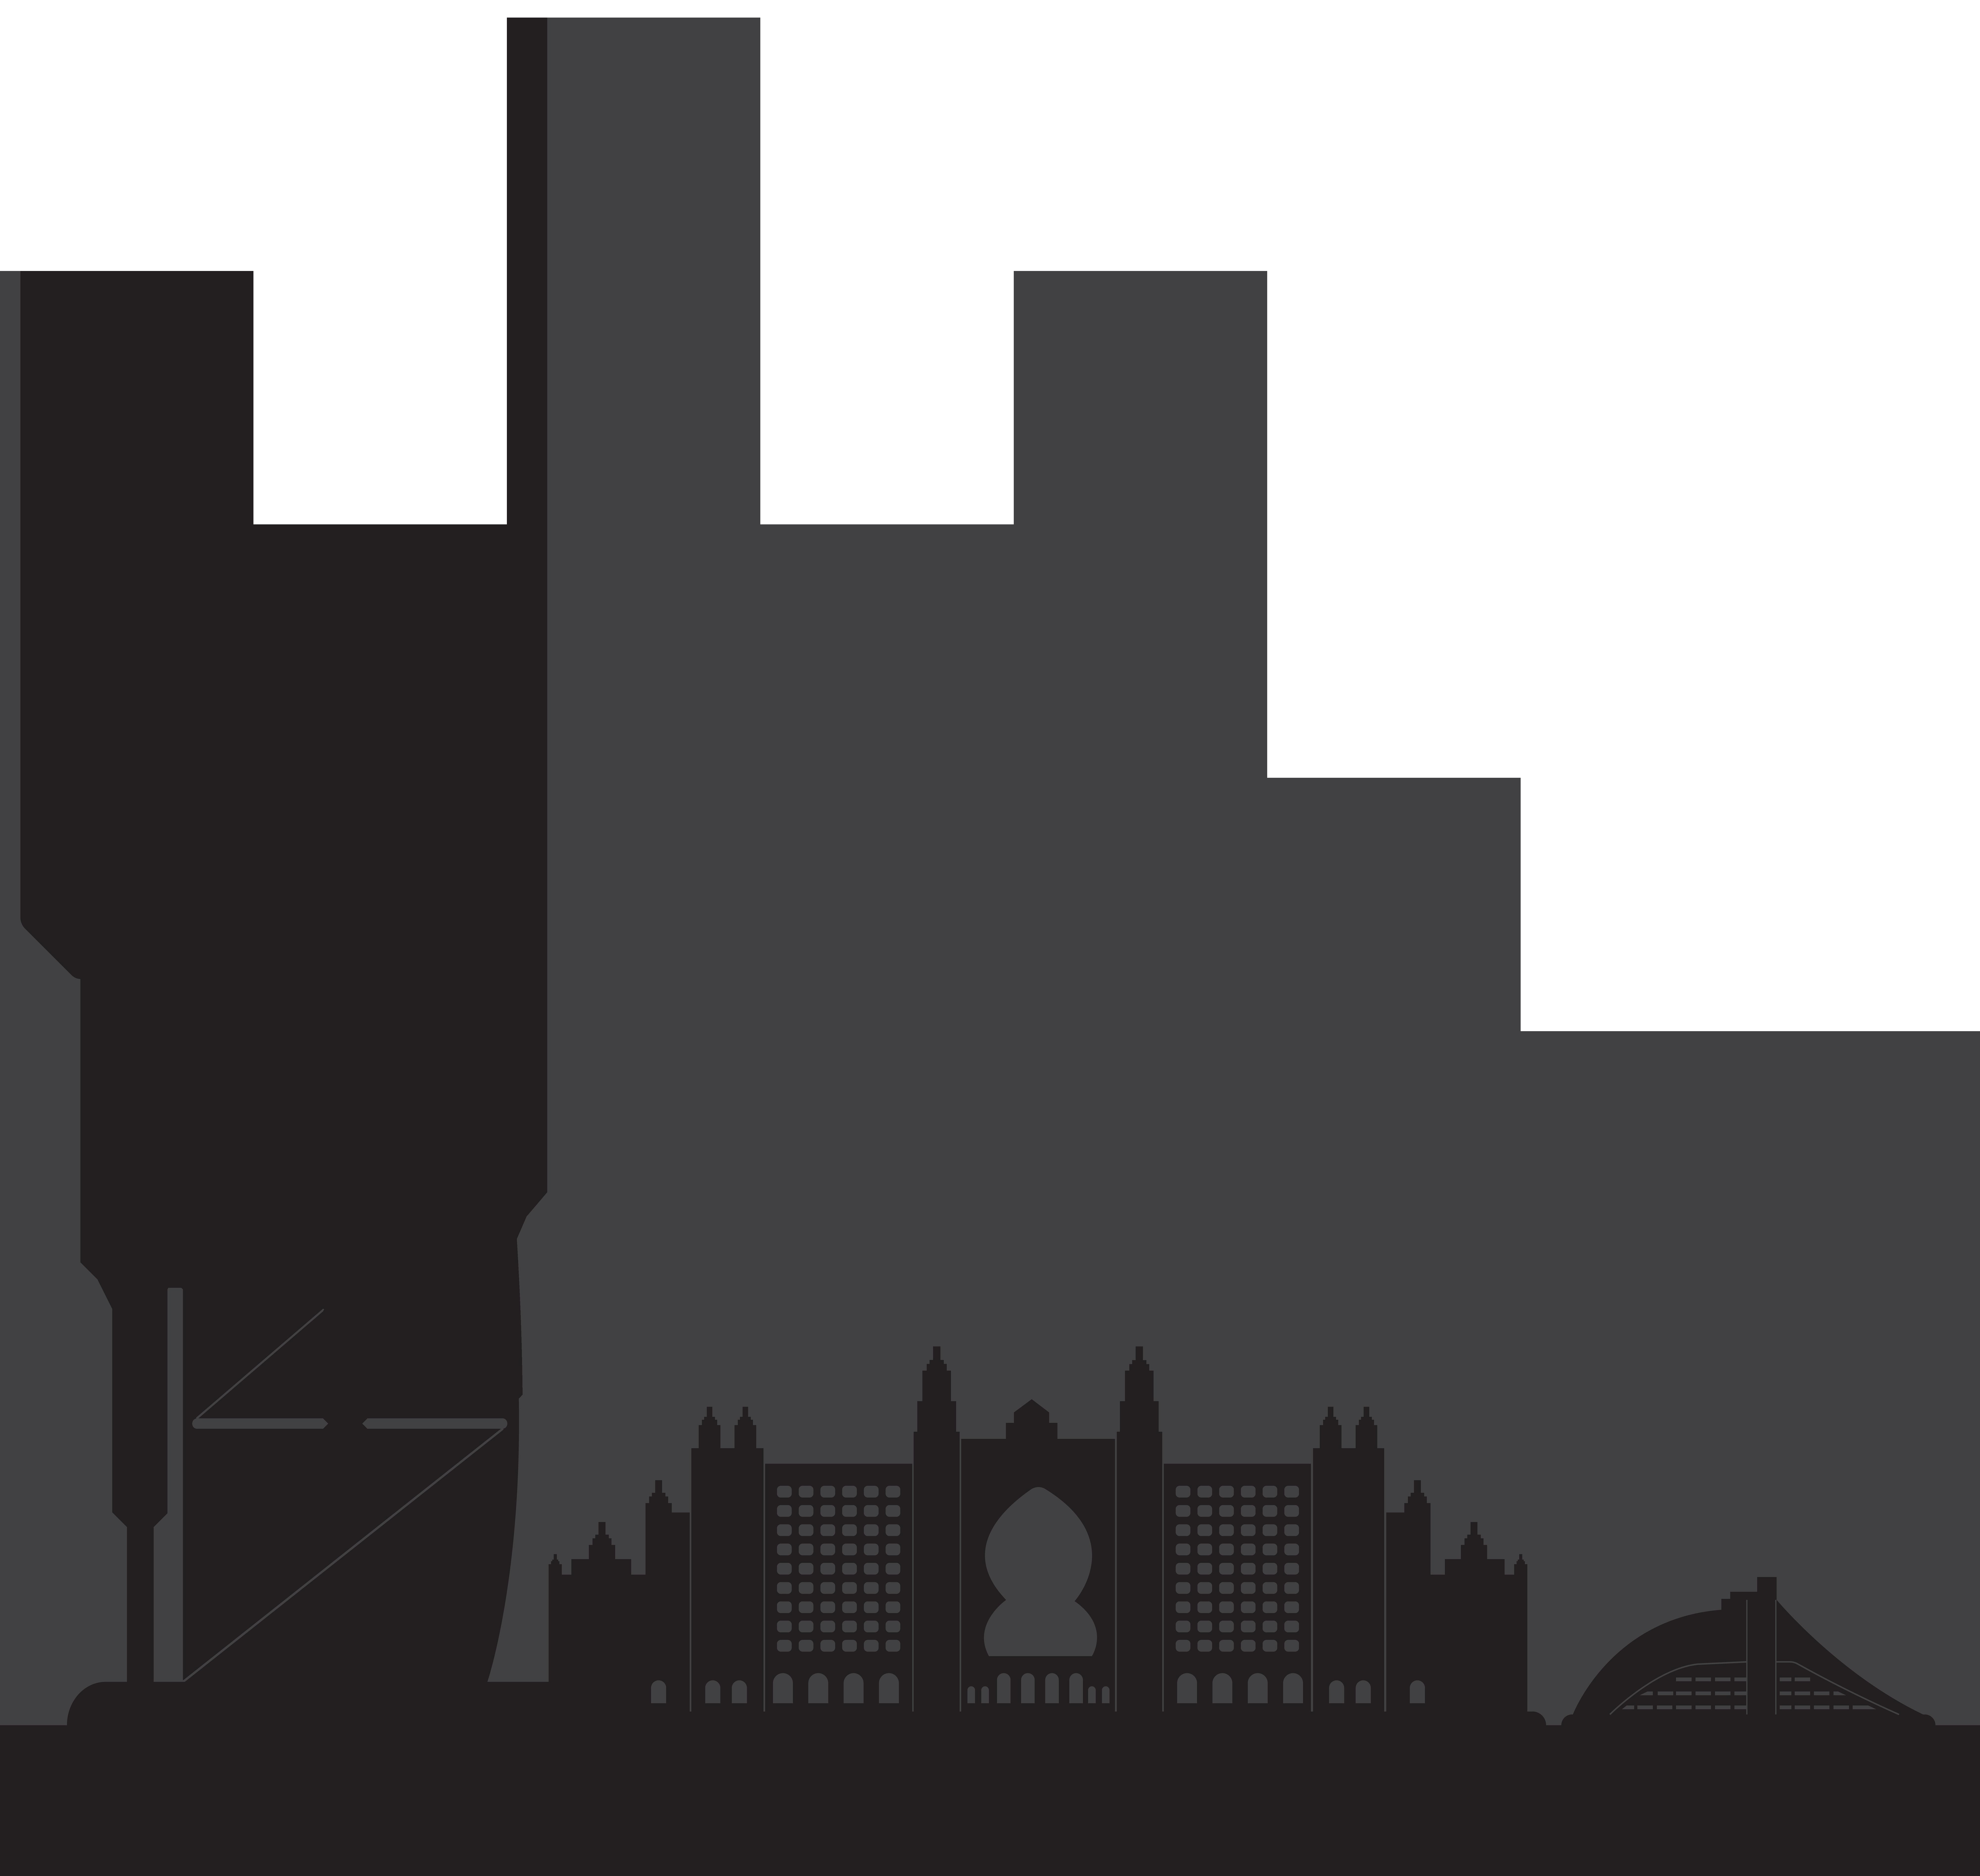 Dubai Skyline Silhouette Clip art.